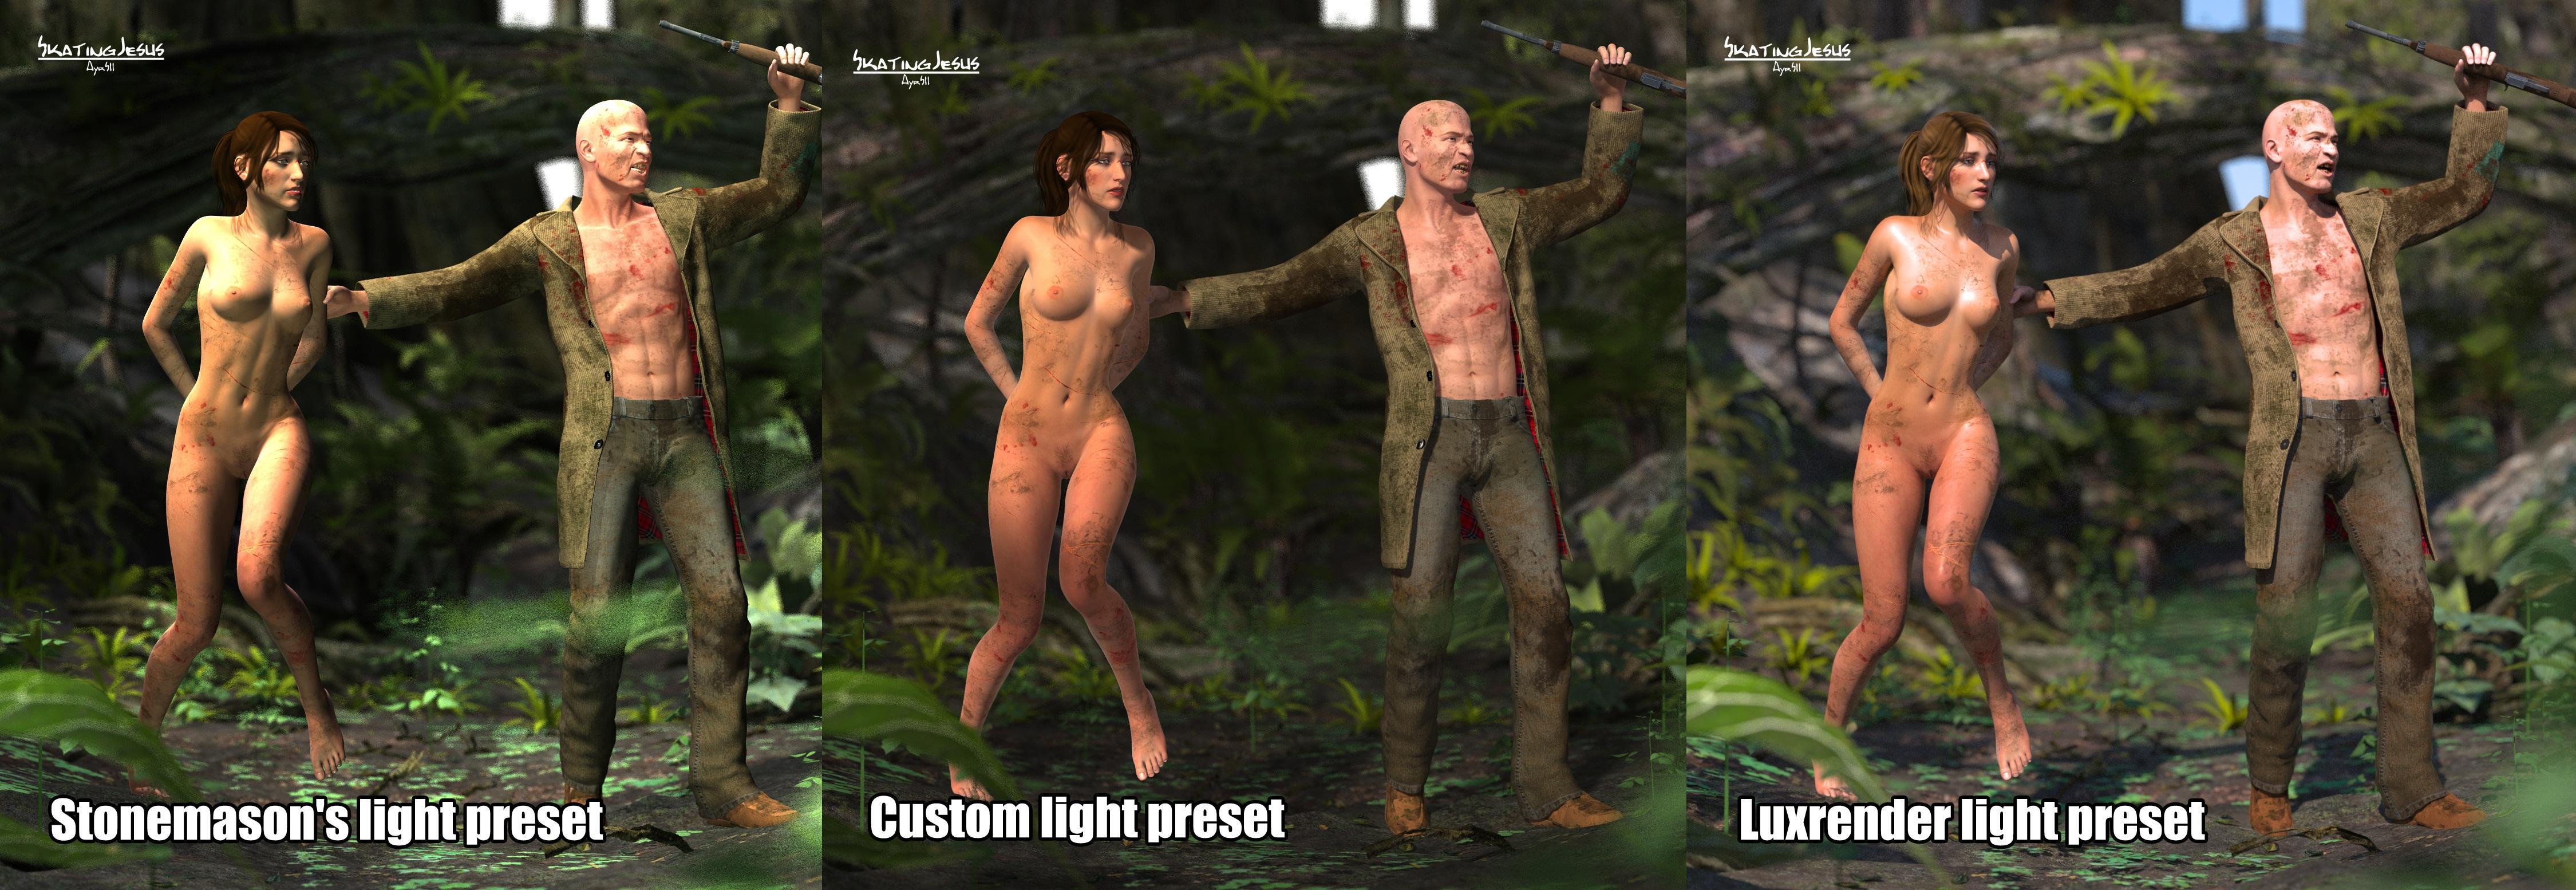 Tomb raider game character nude hentia scenes